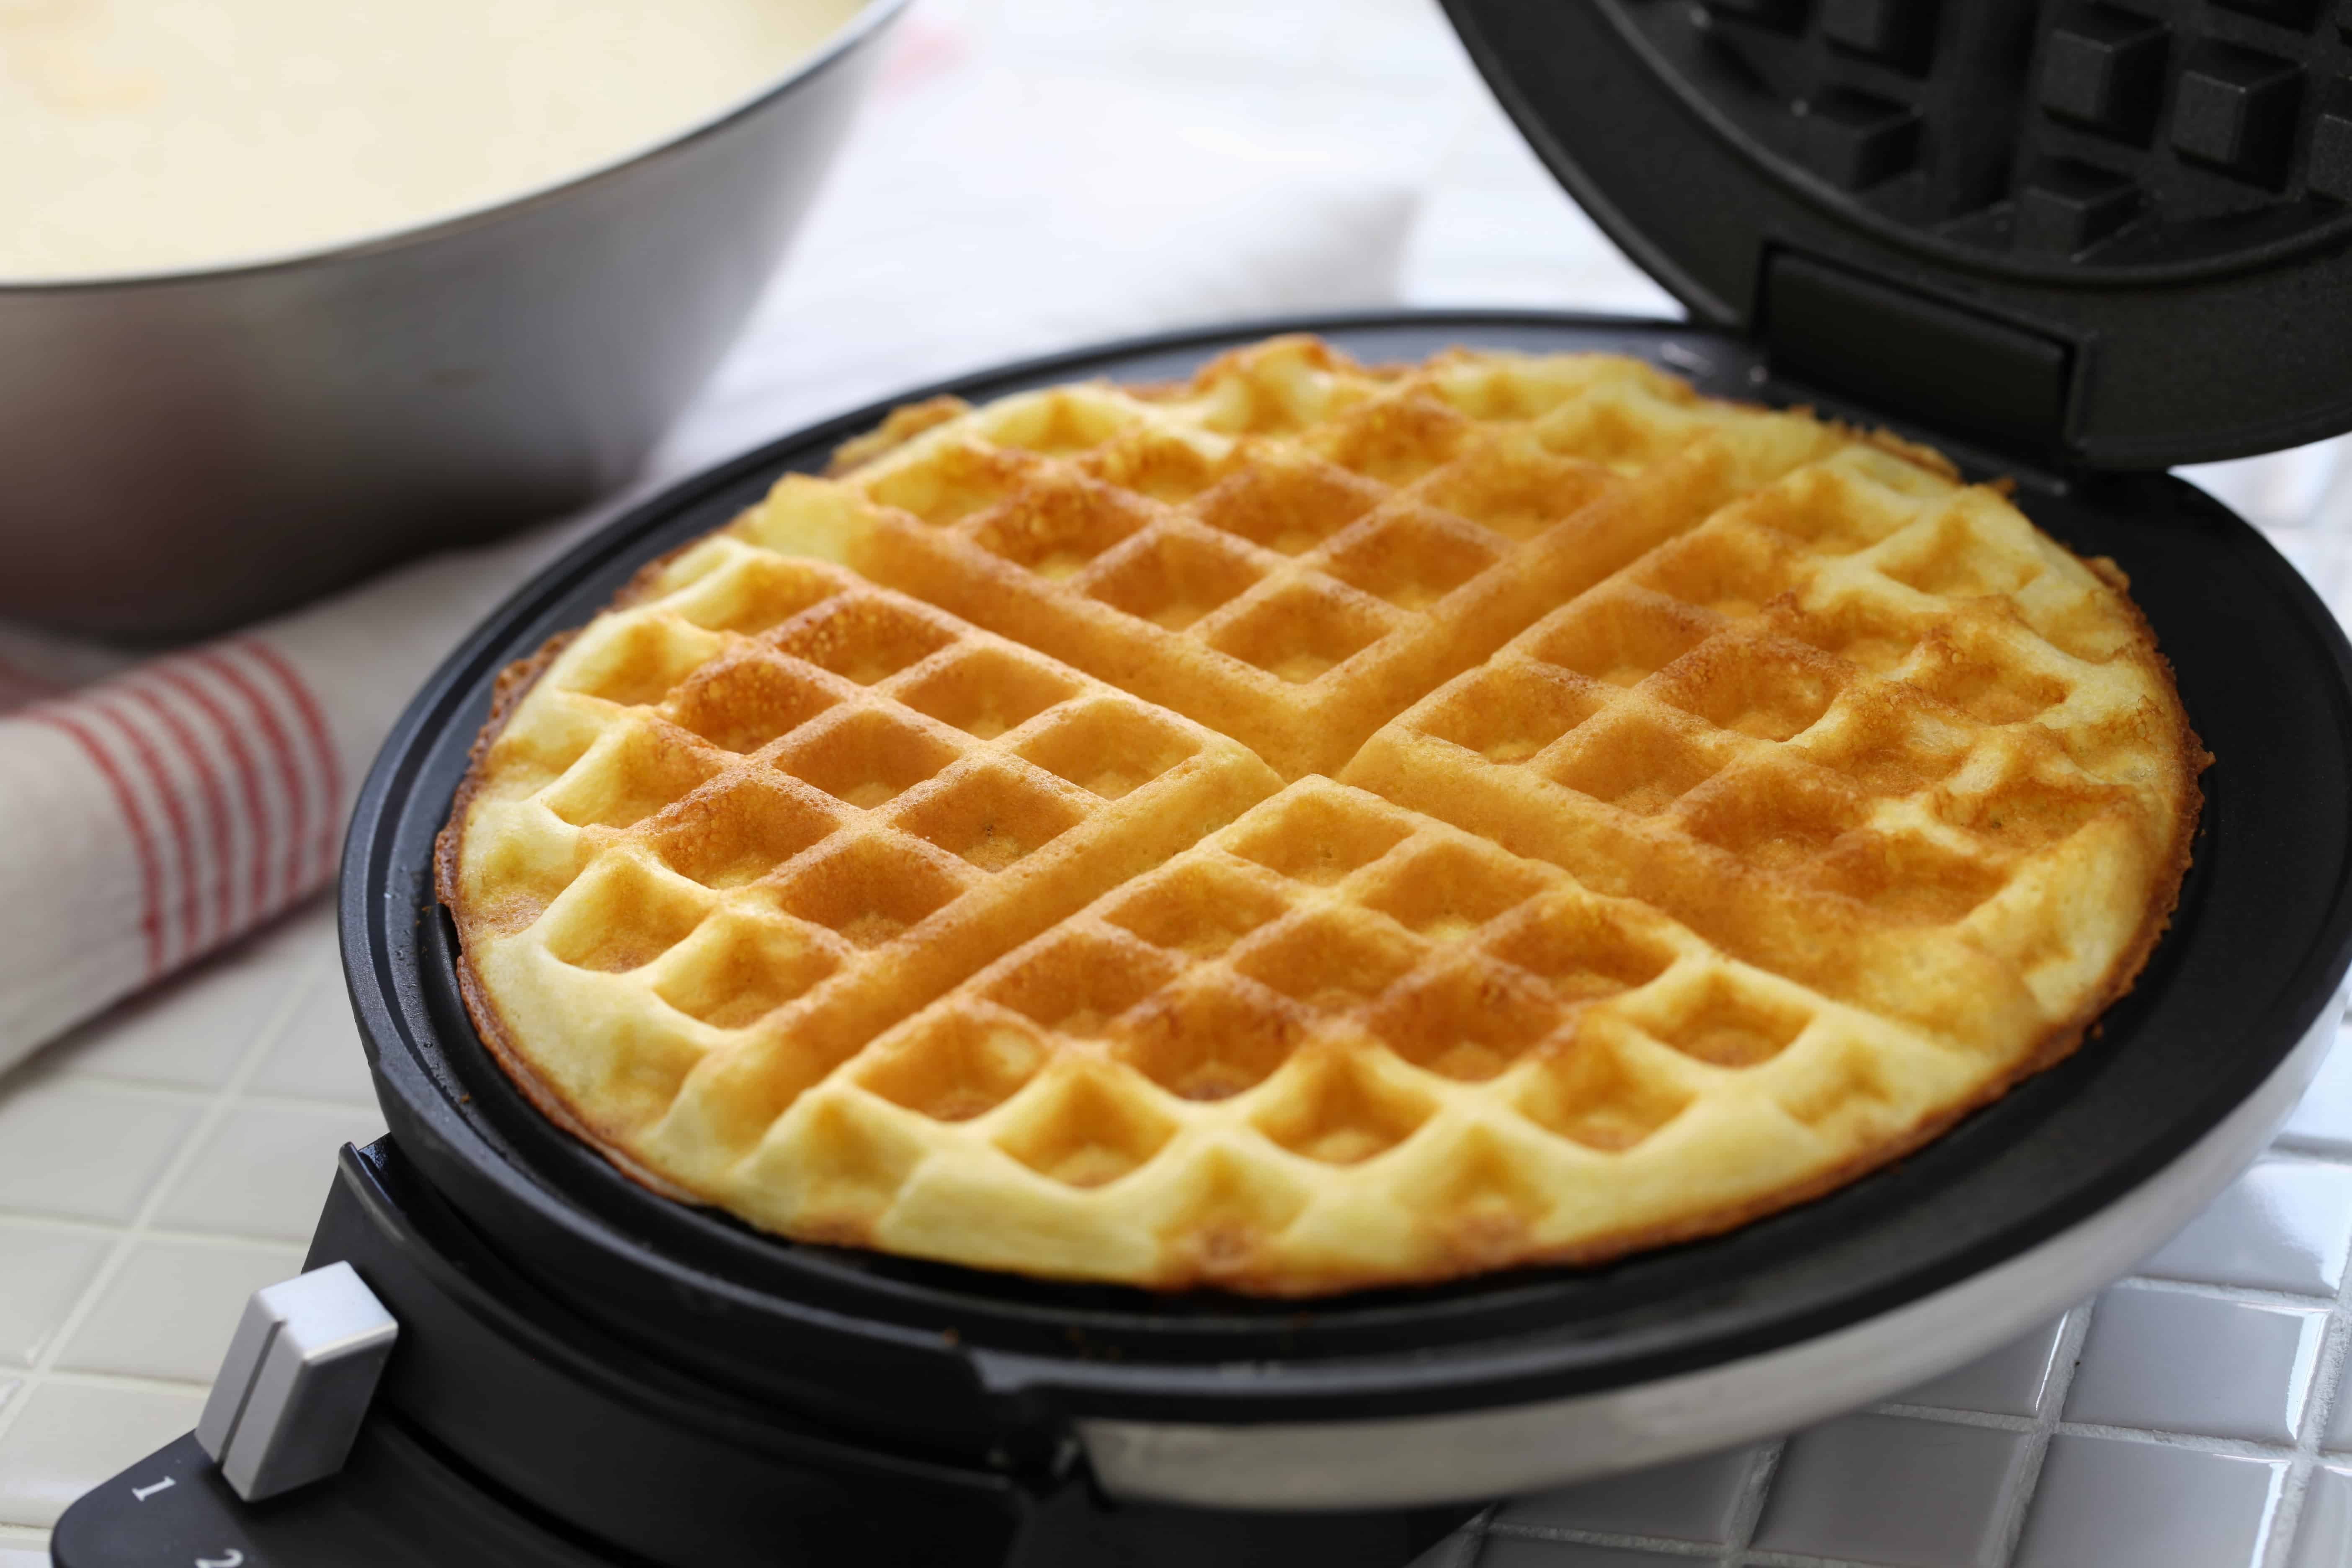 Preparando waffle na máquina.